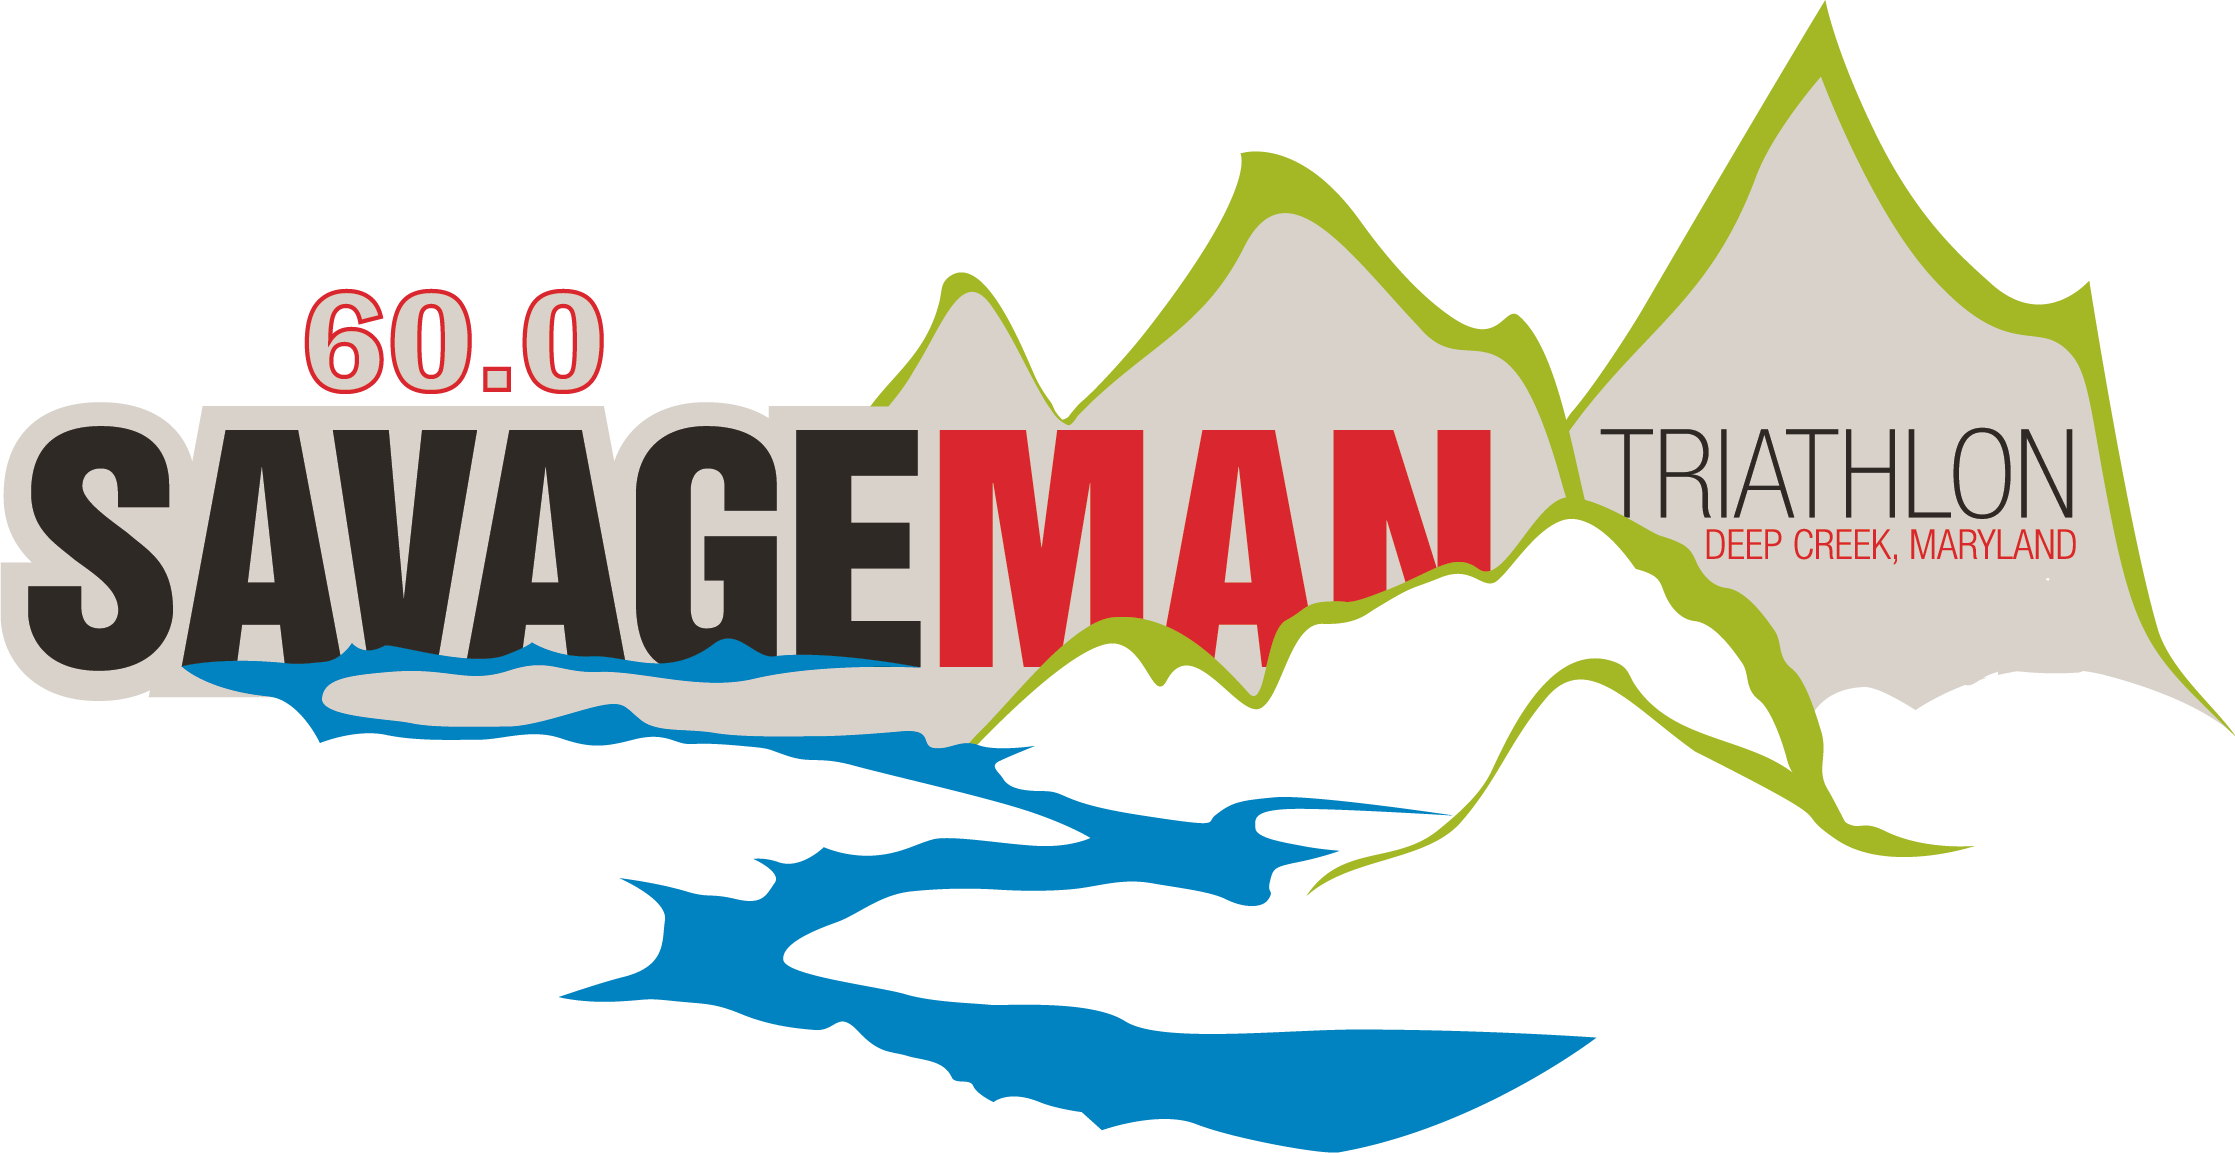 Savagman-Triathlon-No-Date60